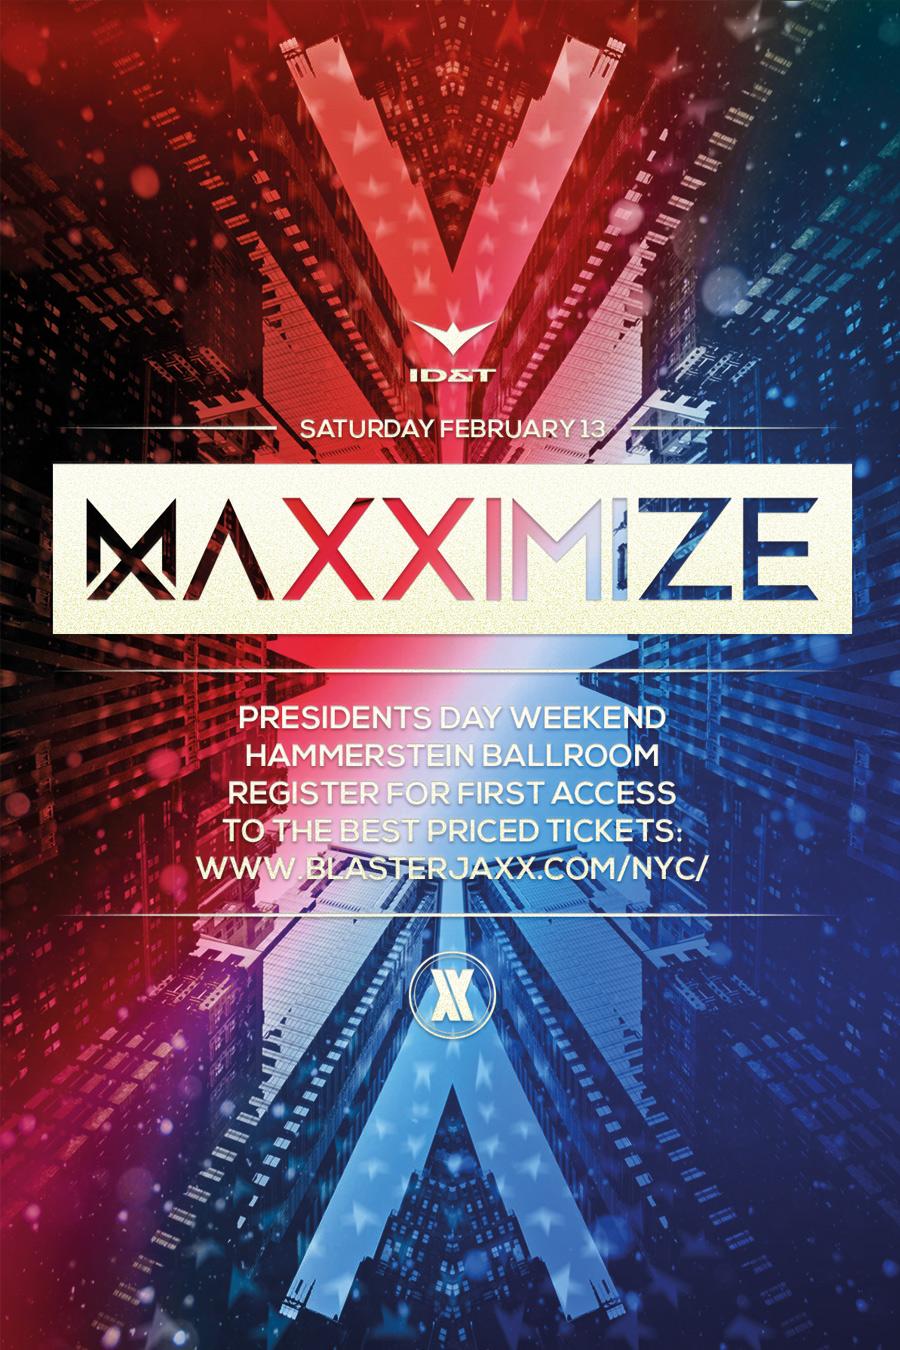 maxximize_webdisplay